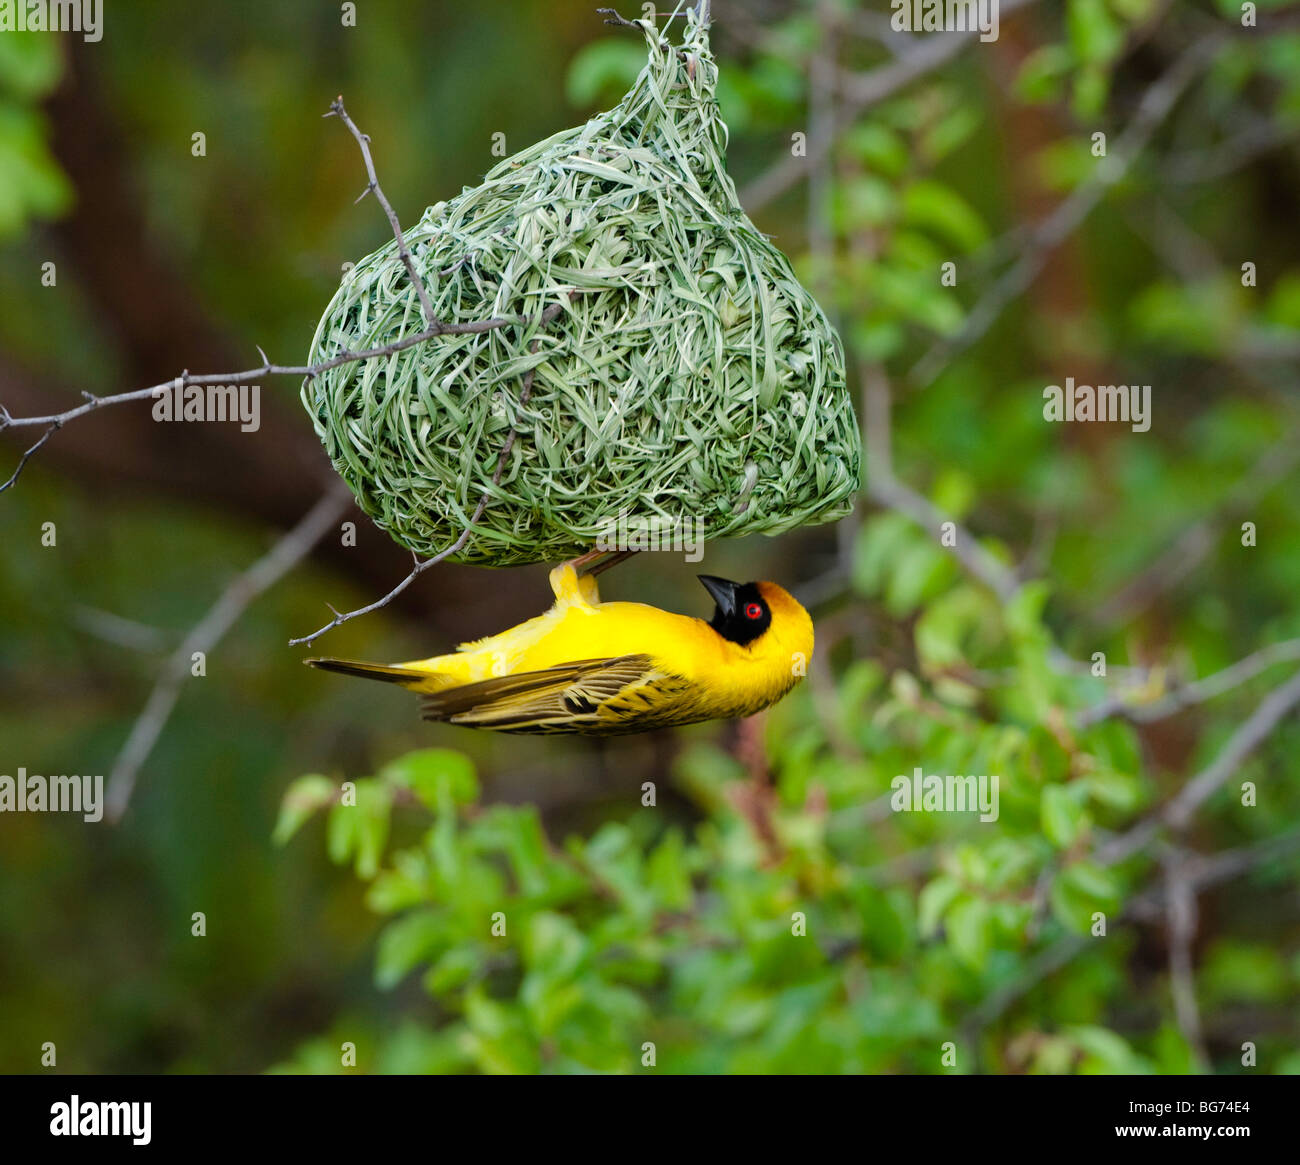 Weaver Bird Building Nest Stock Photos Weaver Bird Building Nest